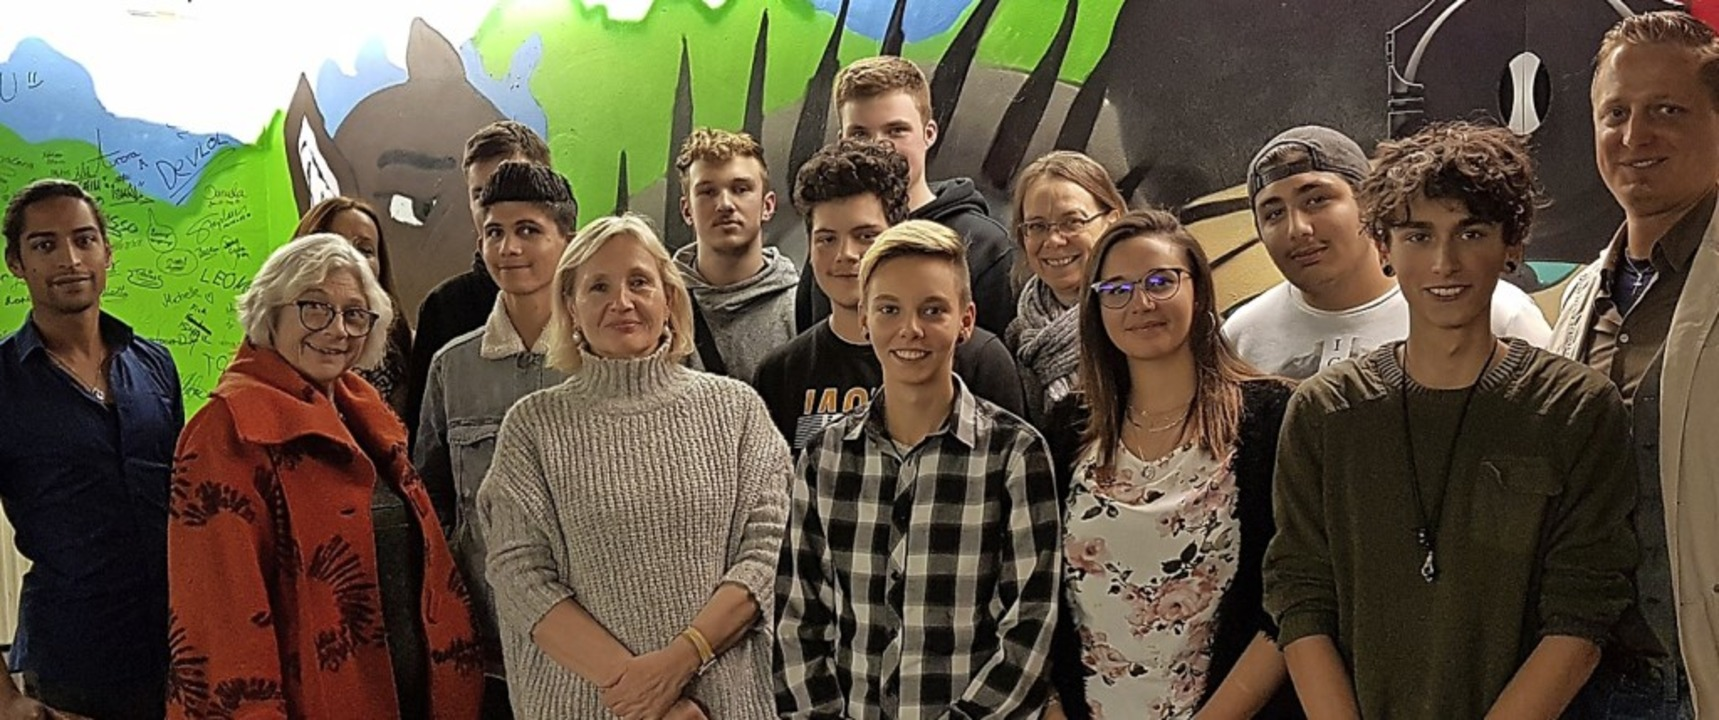 Jugendbetreuer Jeróme Ture (links) und...rner in Vertretung des Bürgermeisters.  | Foto: Cornelia Flury